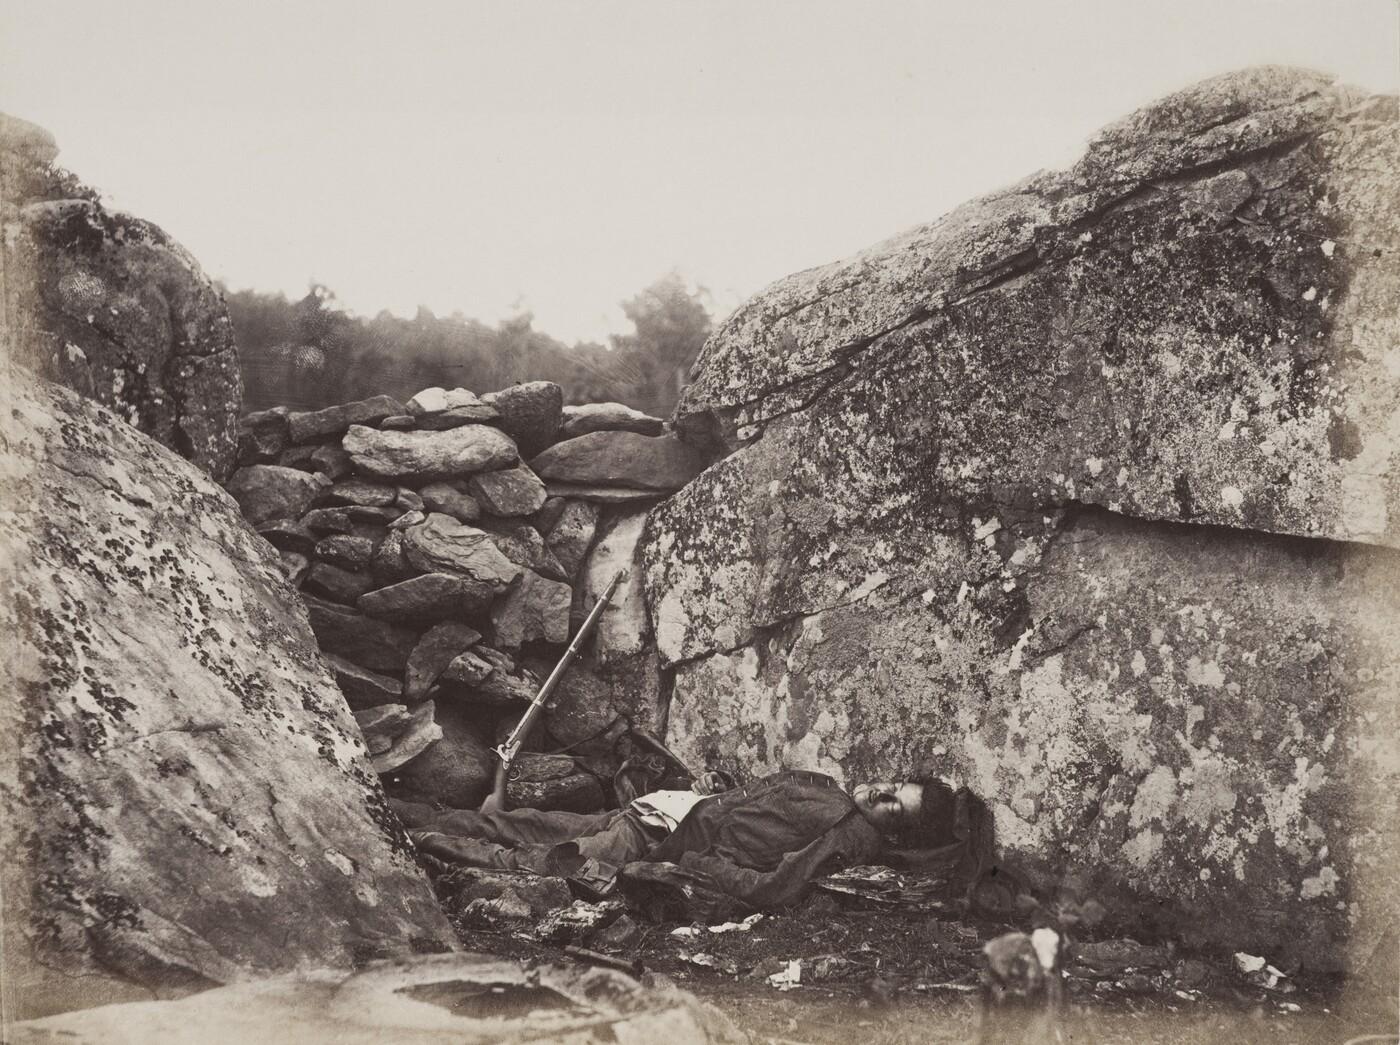 Alexander Gardner (1821–1882), Home of a Rebel Sharpshooter, Gettysburg, 1866, Albumen silver print